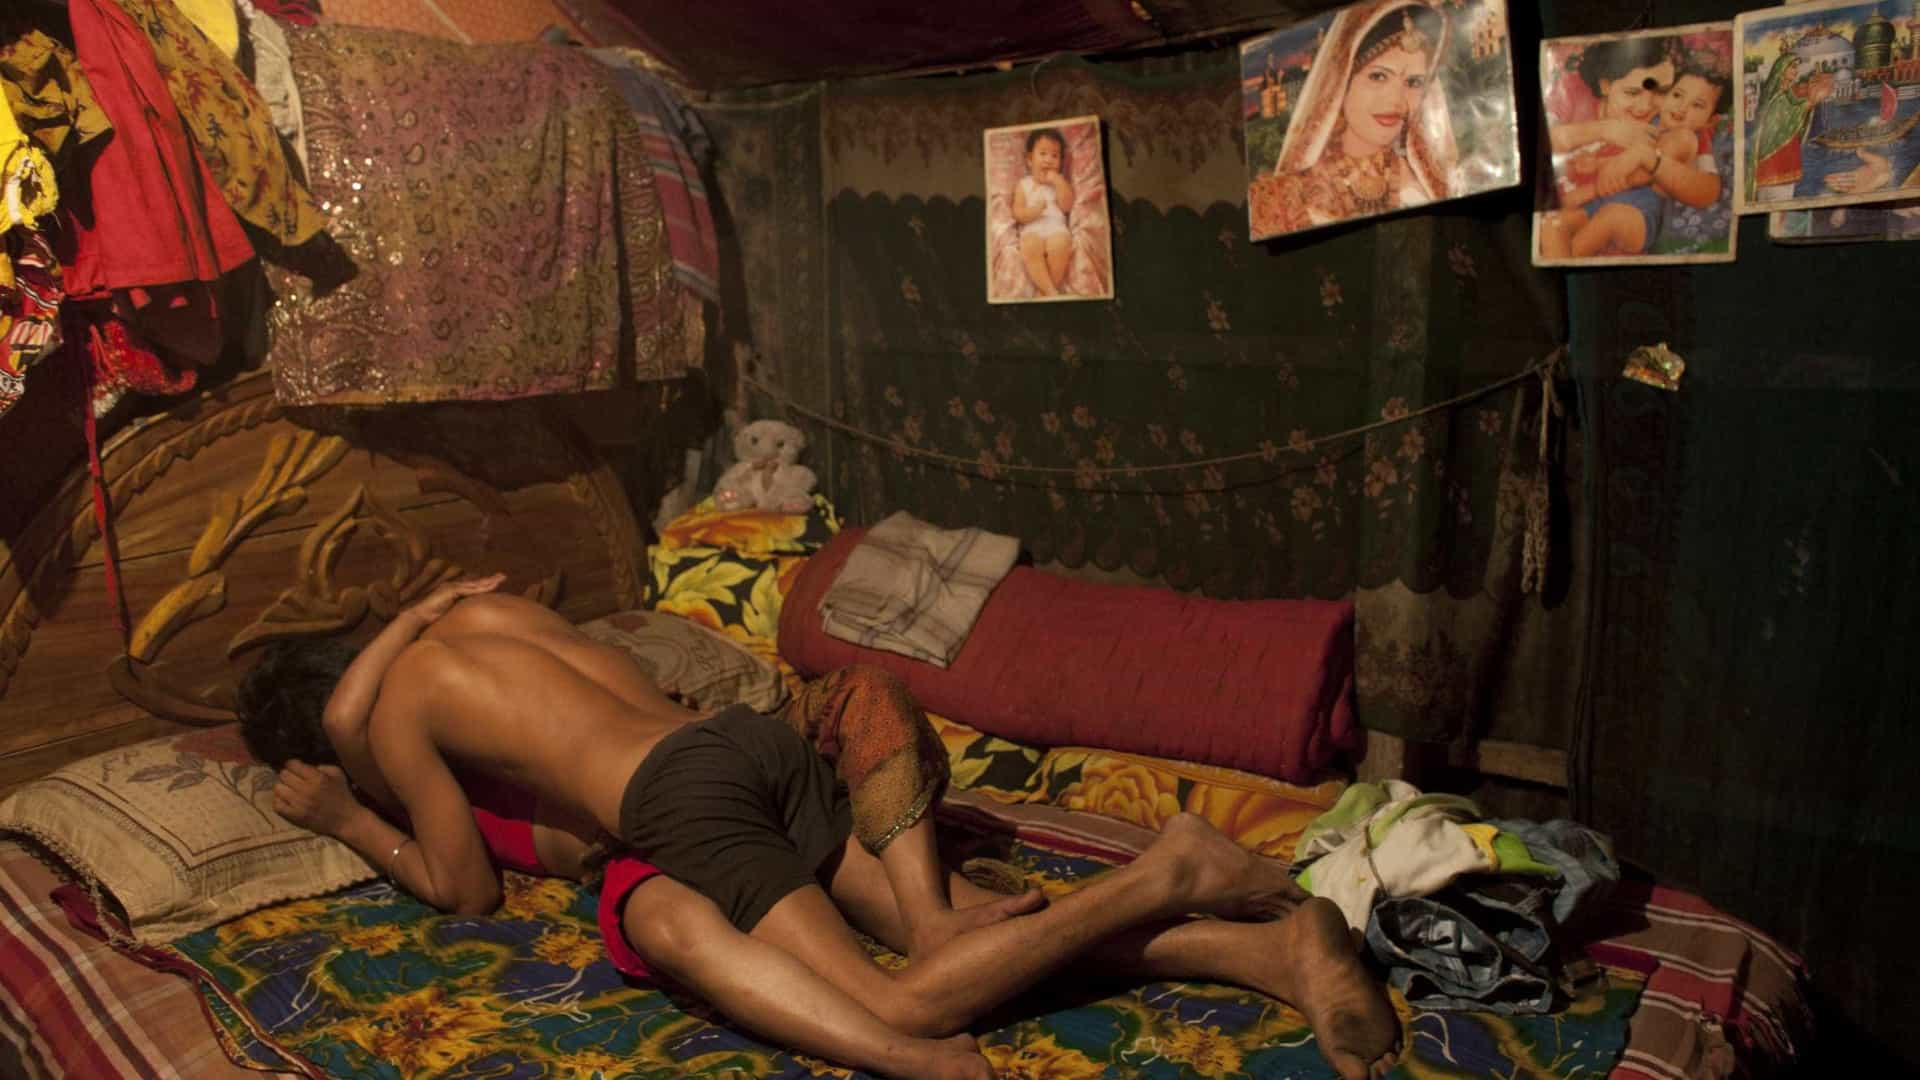 prostitutas en coimbra prostitutas en filipinas